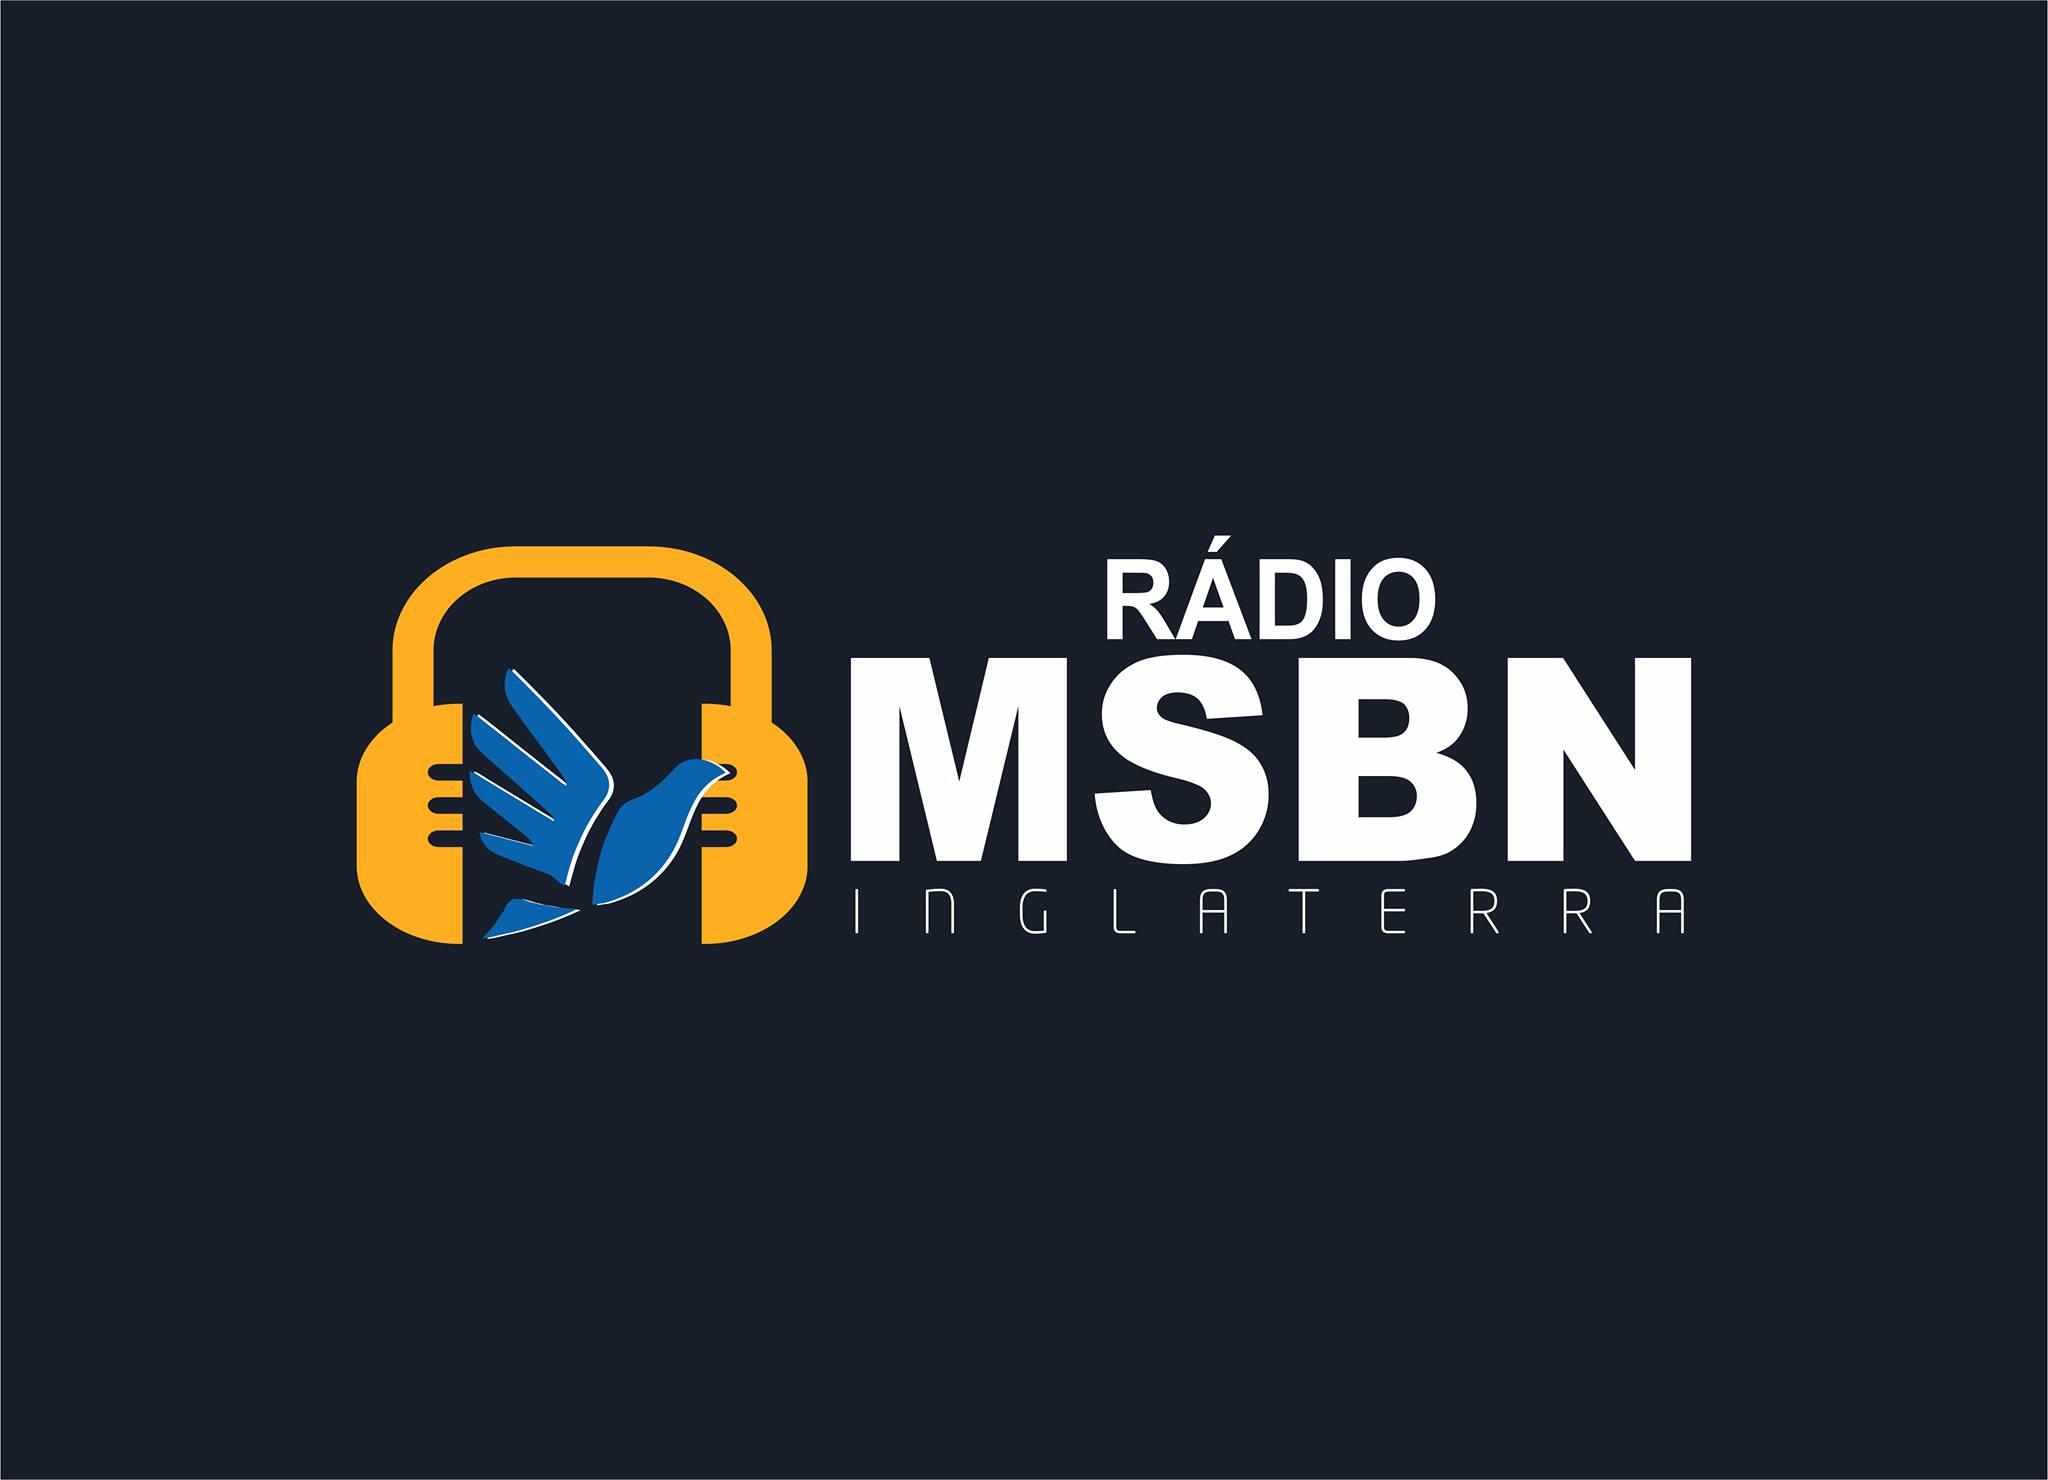 Radio MSBN Inglaterra 24 horas no Ar!